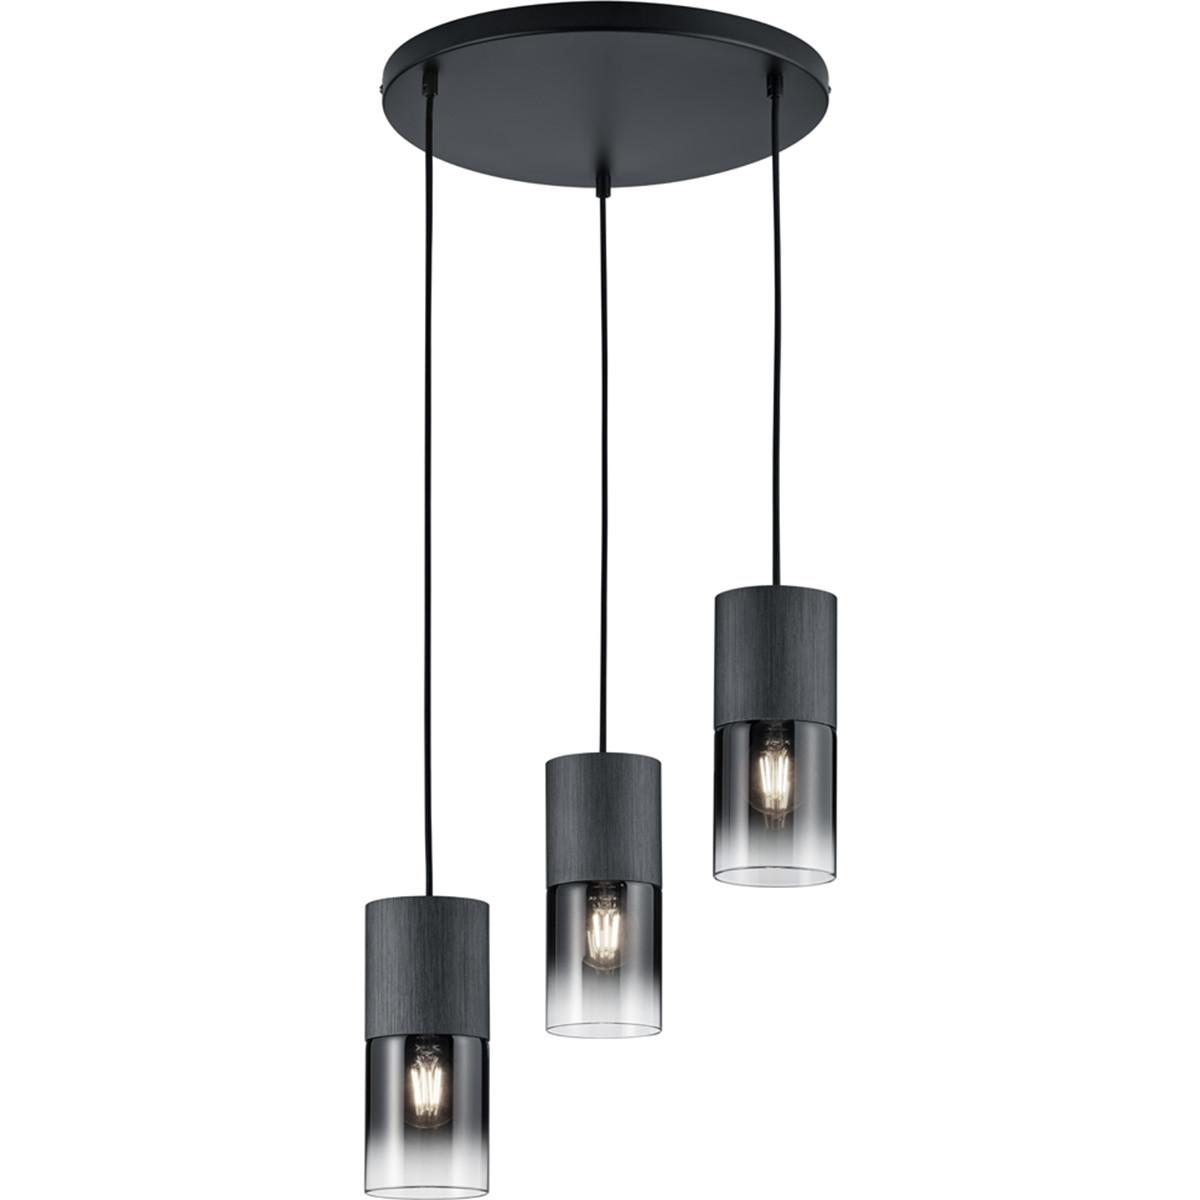 LED Hanglamp - Trion Roba - E27 Fitting - 3-lichts - Rond - Mat Zwart Rookglas - Aluminium